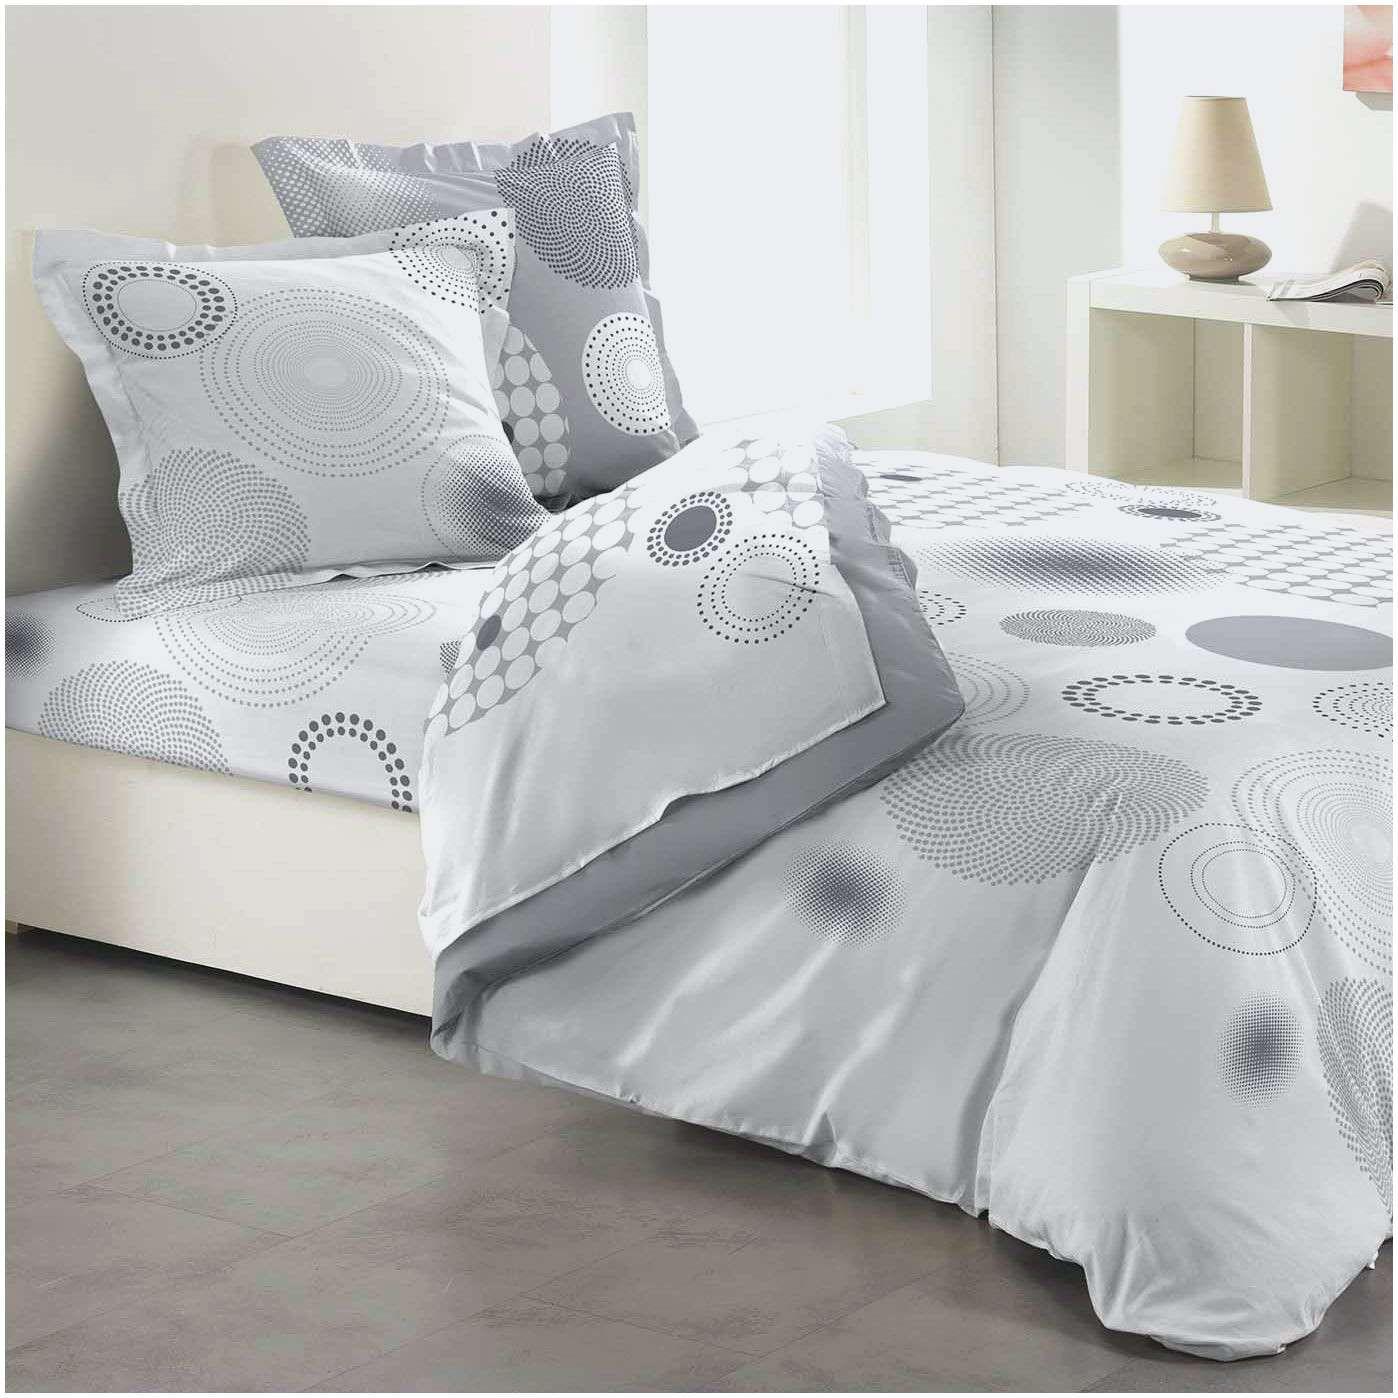 Couette 4 Saisons Ikea Couette 4 Saisons Ikea Grusblad Couette Toutes Saisons 240x220 Cm Ikea Ikea Grusblad Couette Toutes Saisons 240x22 Home Decor Home Bed